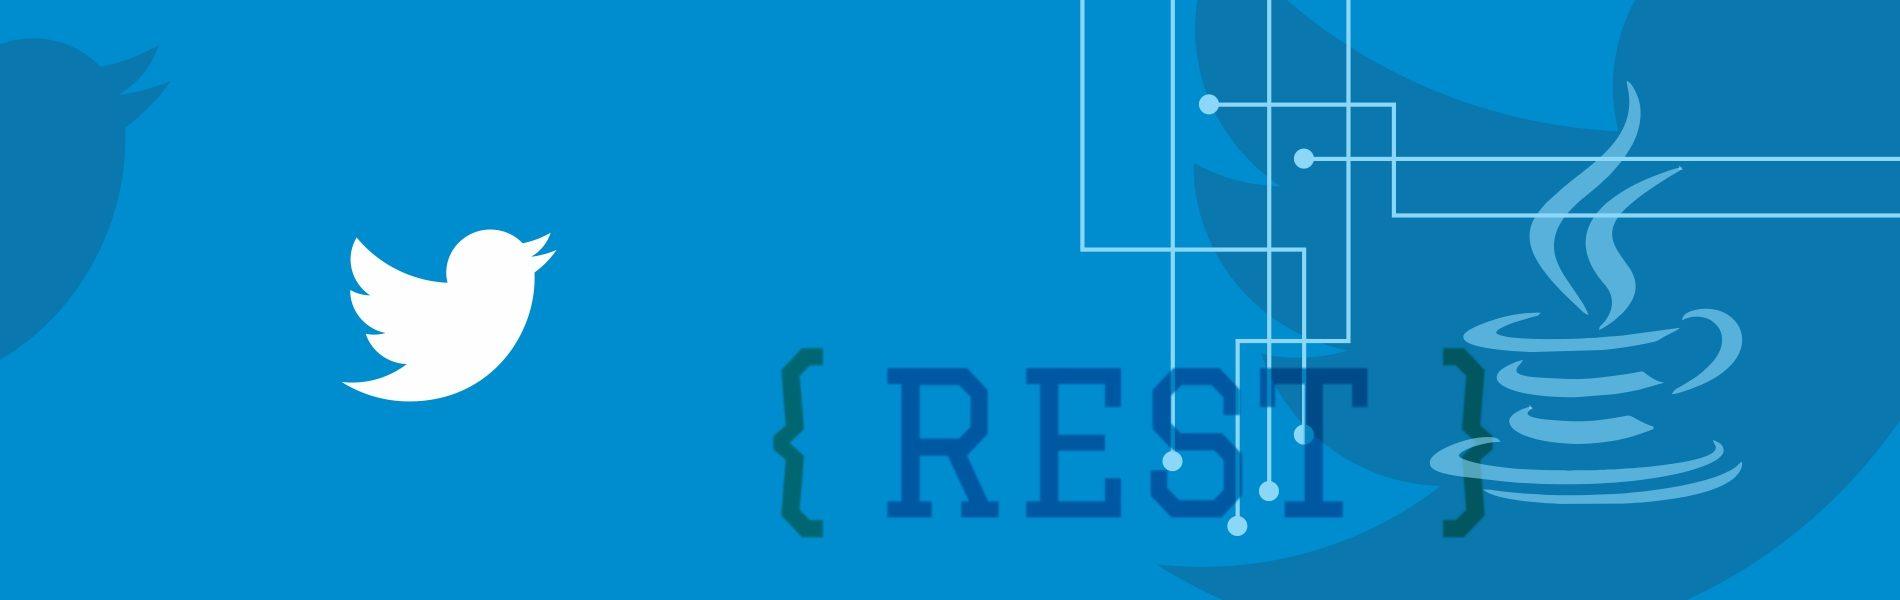 Twitter REST APIs in Java | Tudip